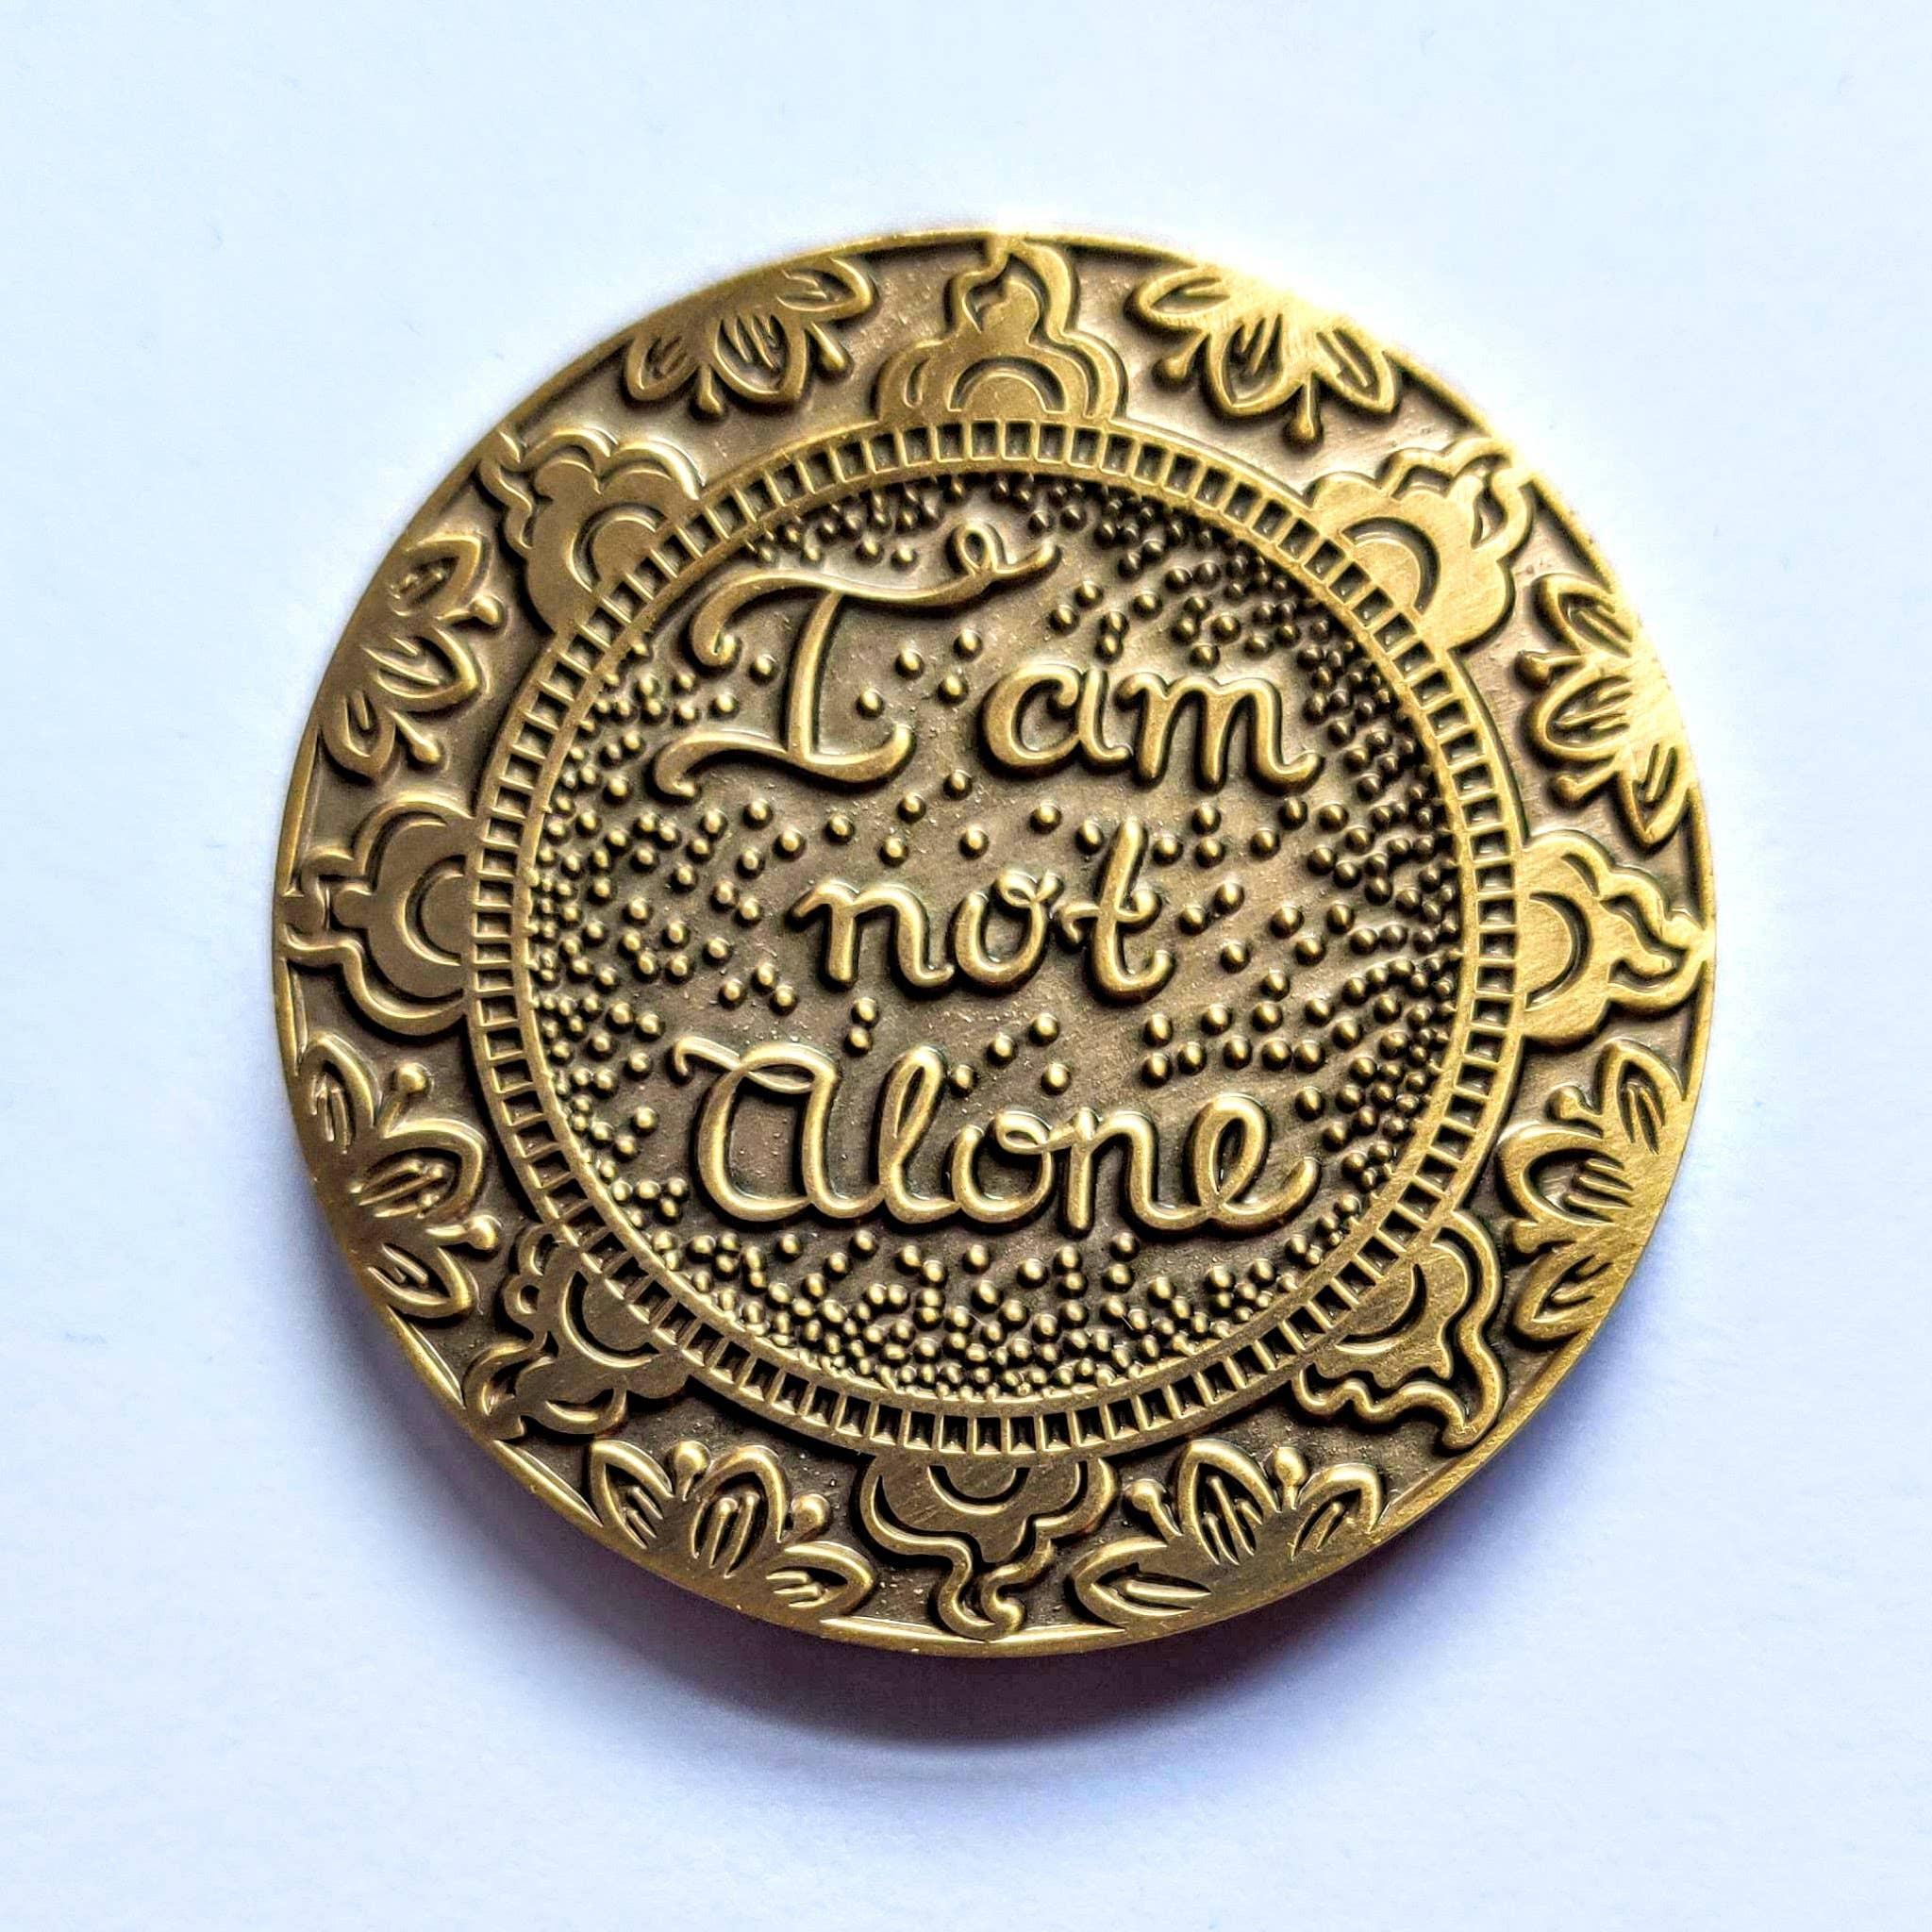 I Am Not Alone Mantra Medallion Antique Gold | Trada Marketplace